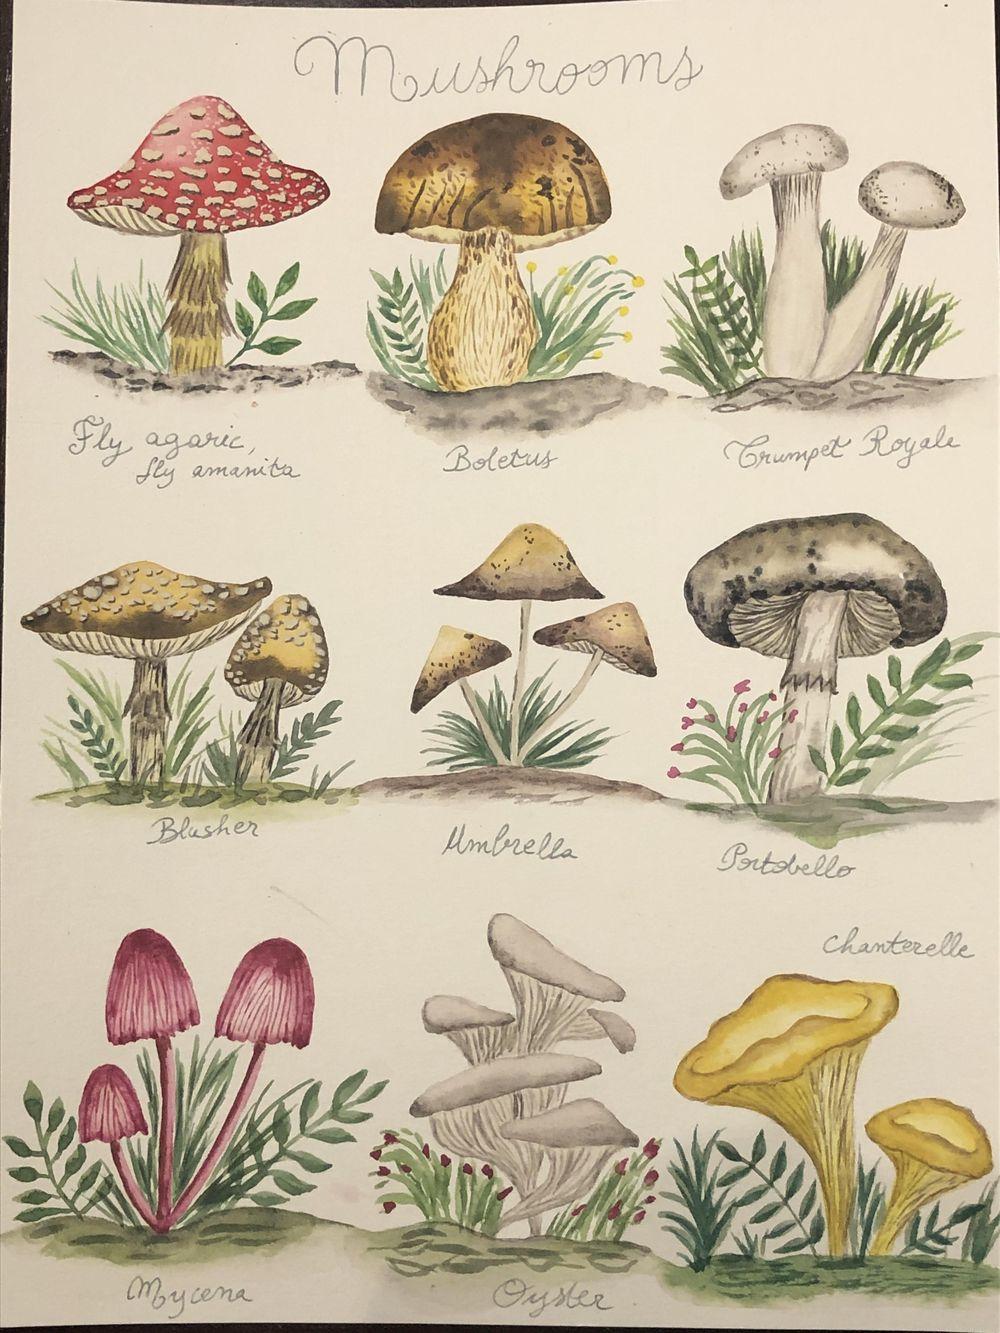 Mushrooms! - image 1 - student project